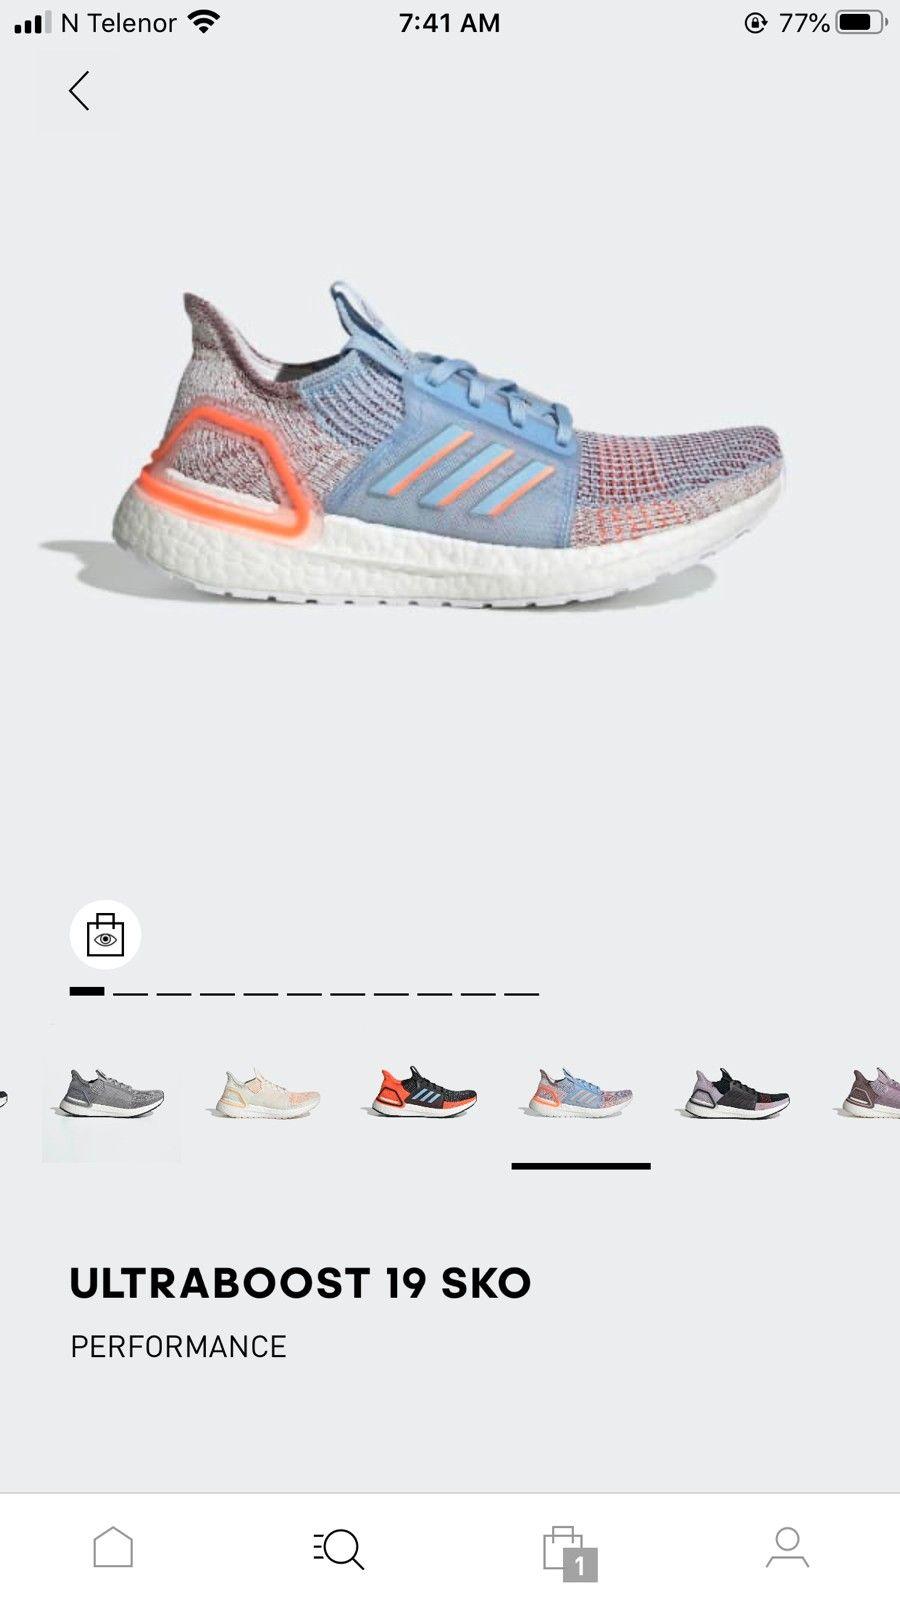 Adidas Ultra boost | FINN.no